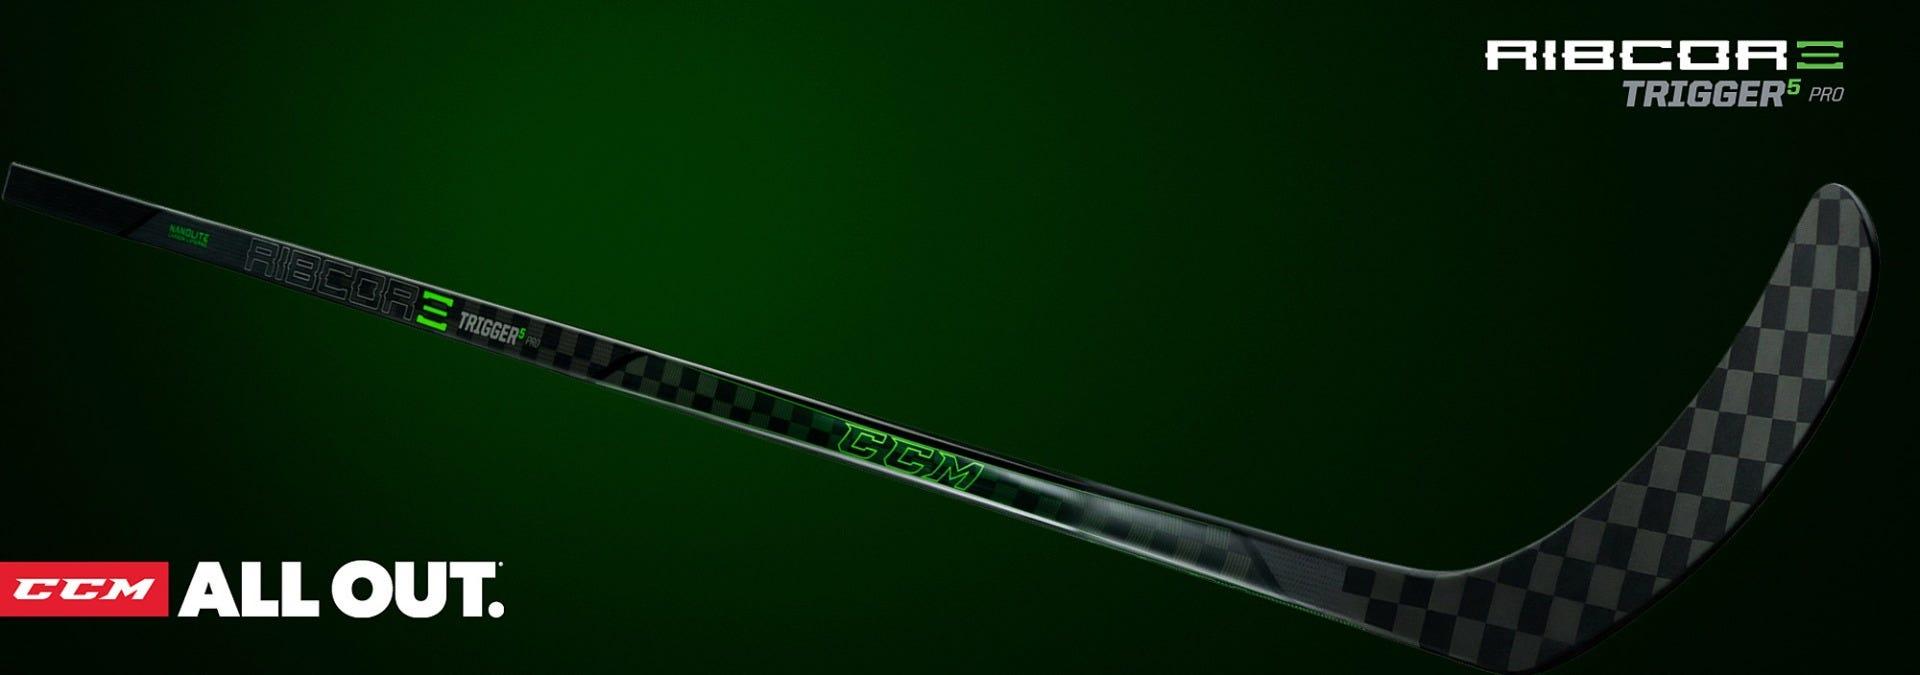 CCM RibCor Trigger 5 Pro Hockey Sticks